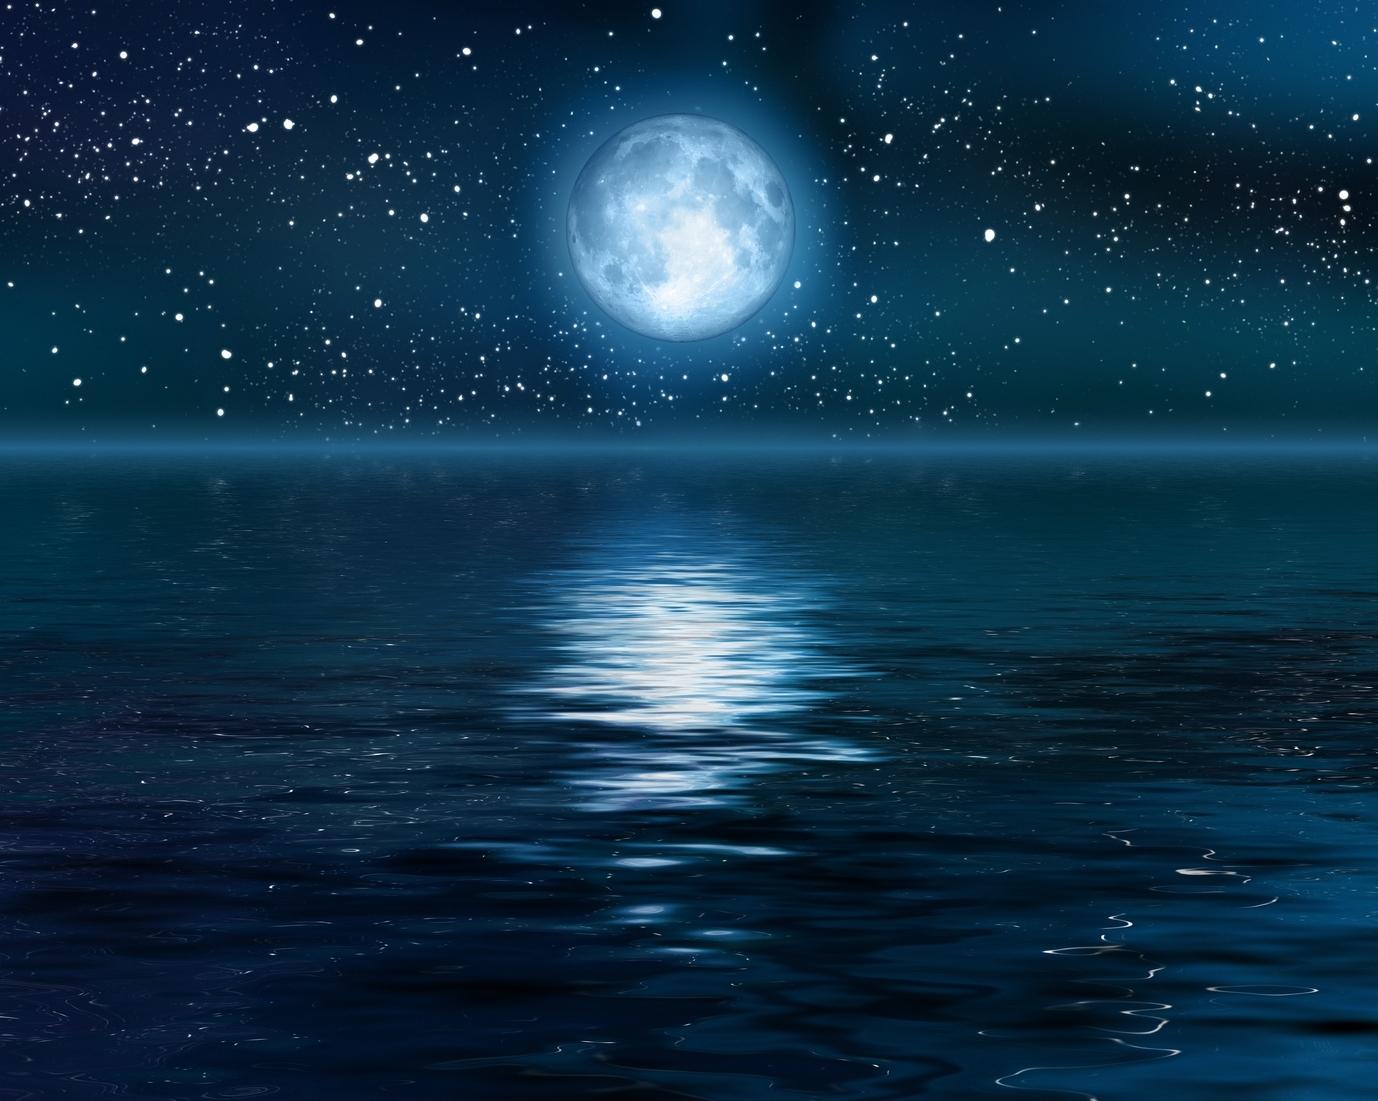 BIBfull-moon-over-ocean.jpg